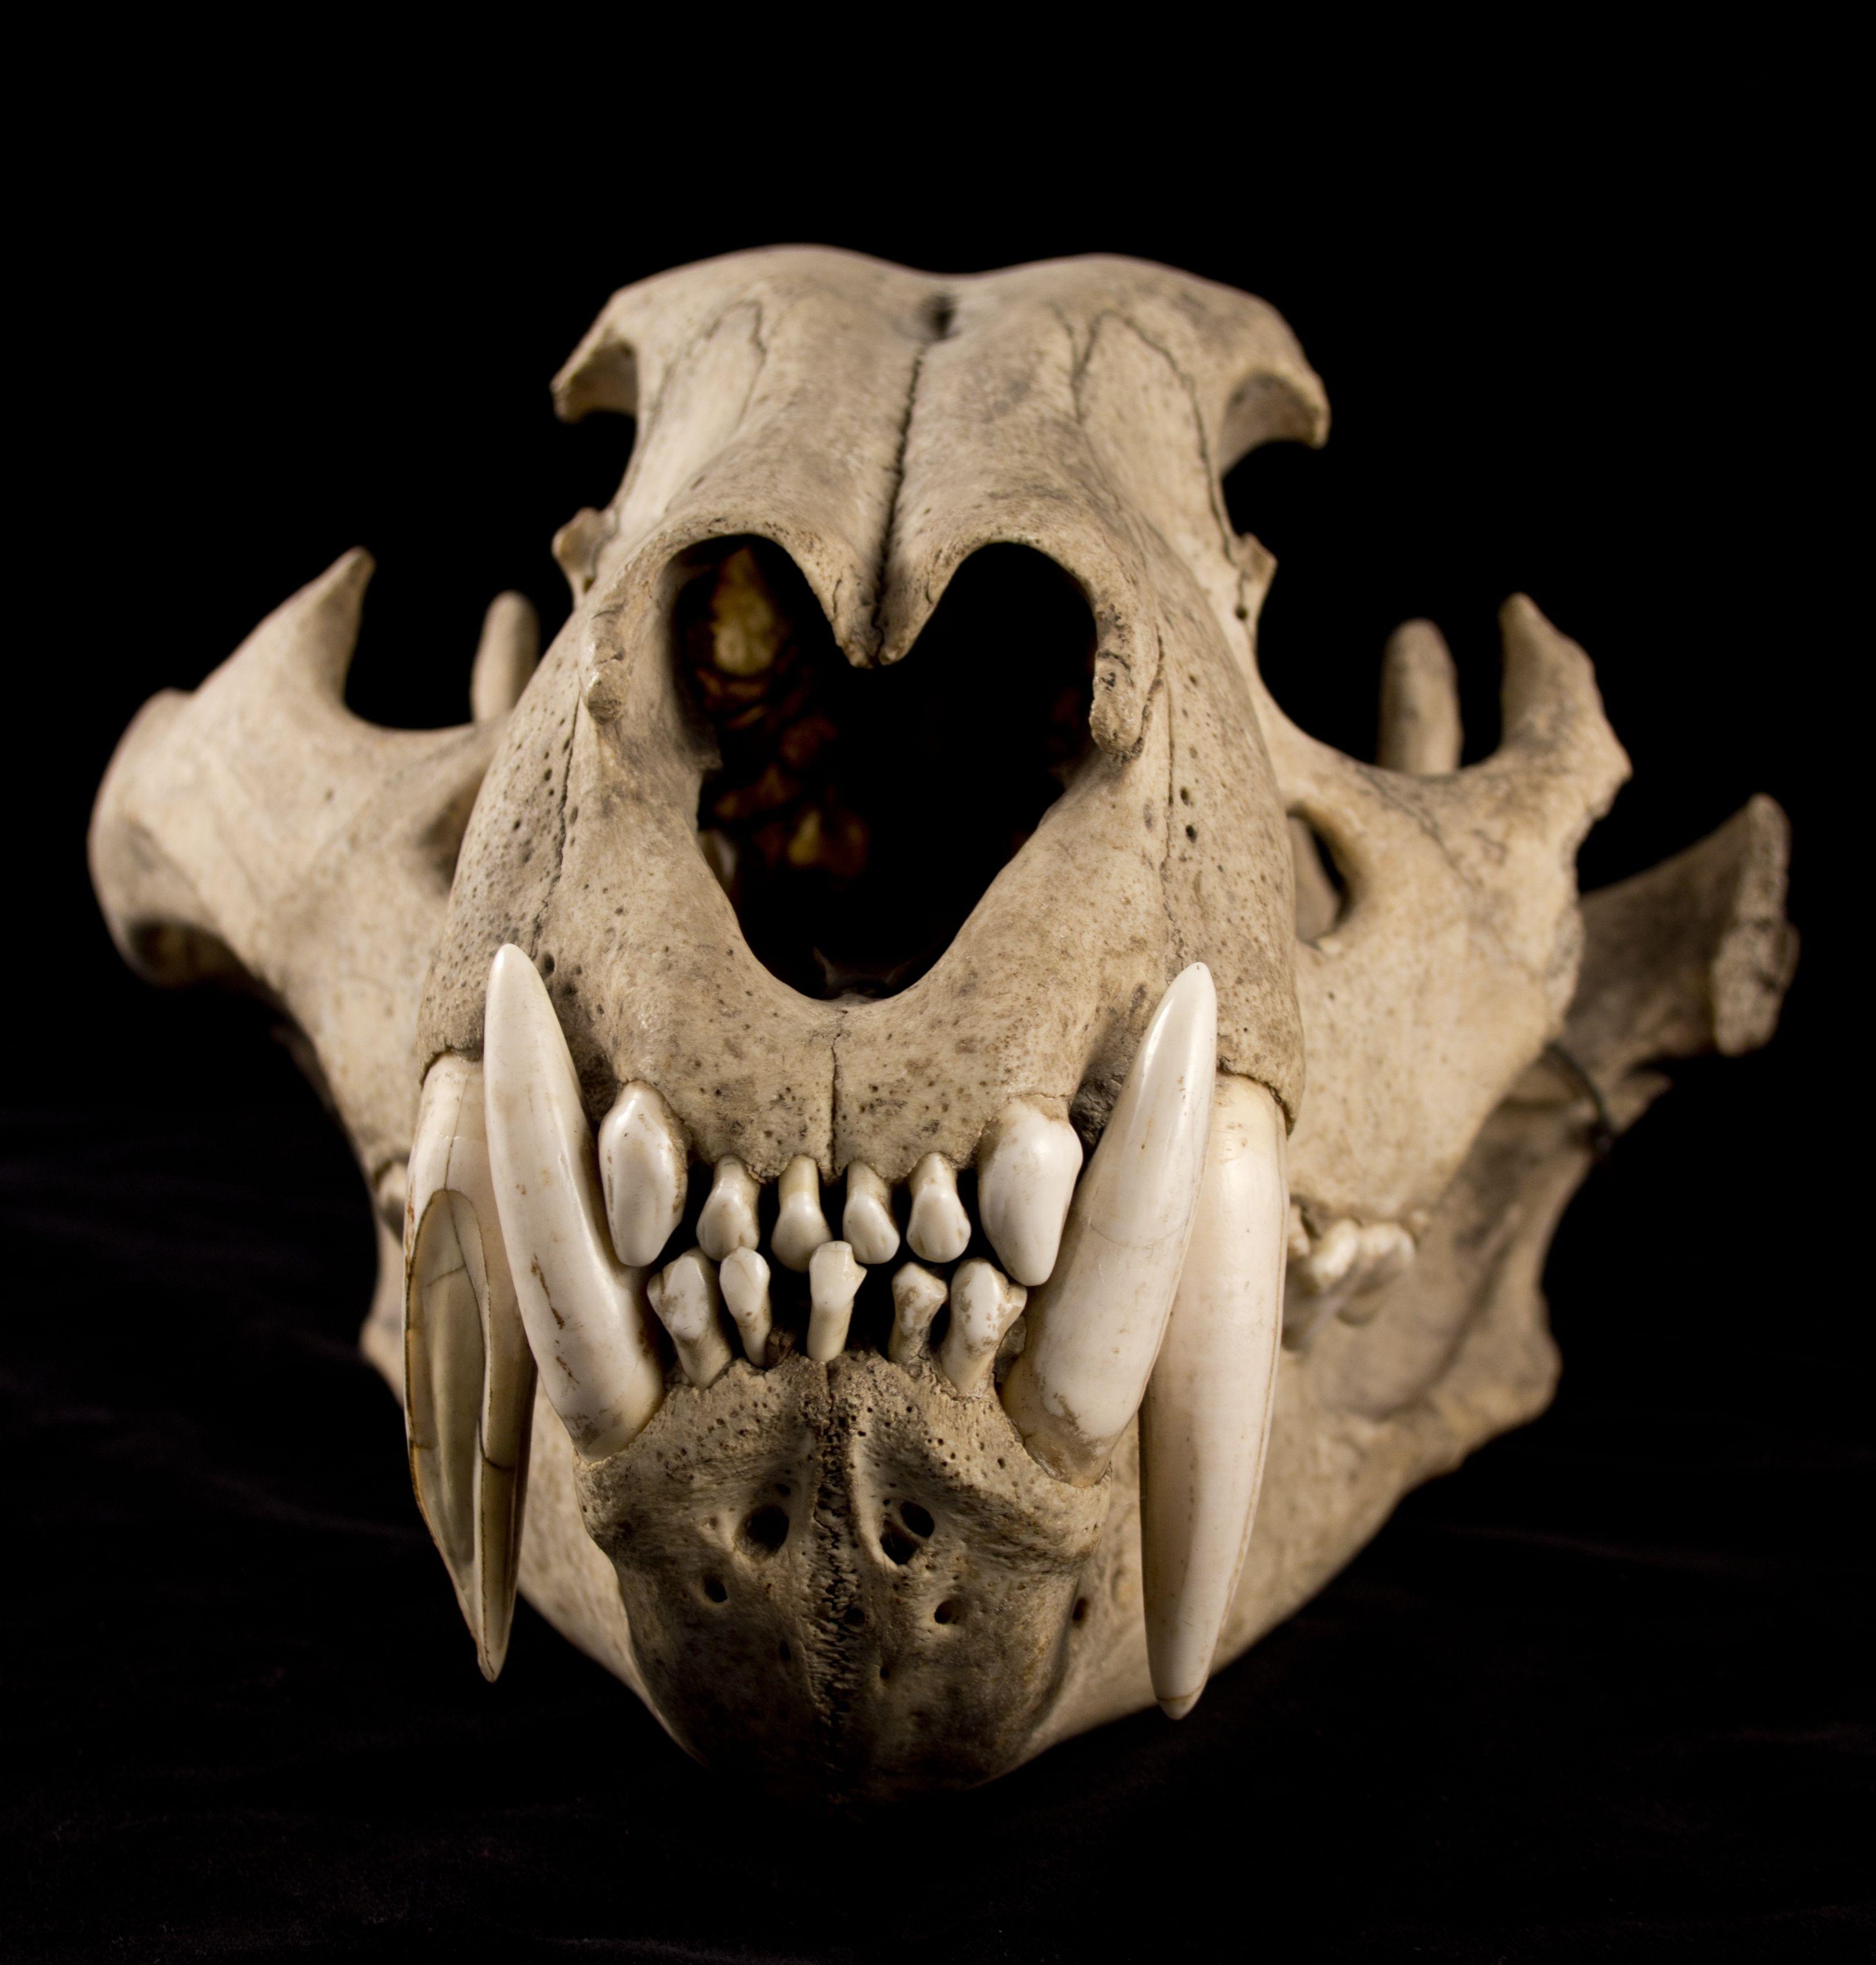 Cat Skull Front Saber tooth ti | tatoo | Pinterest | Skulls, Cat ...